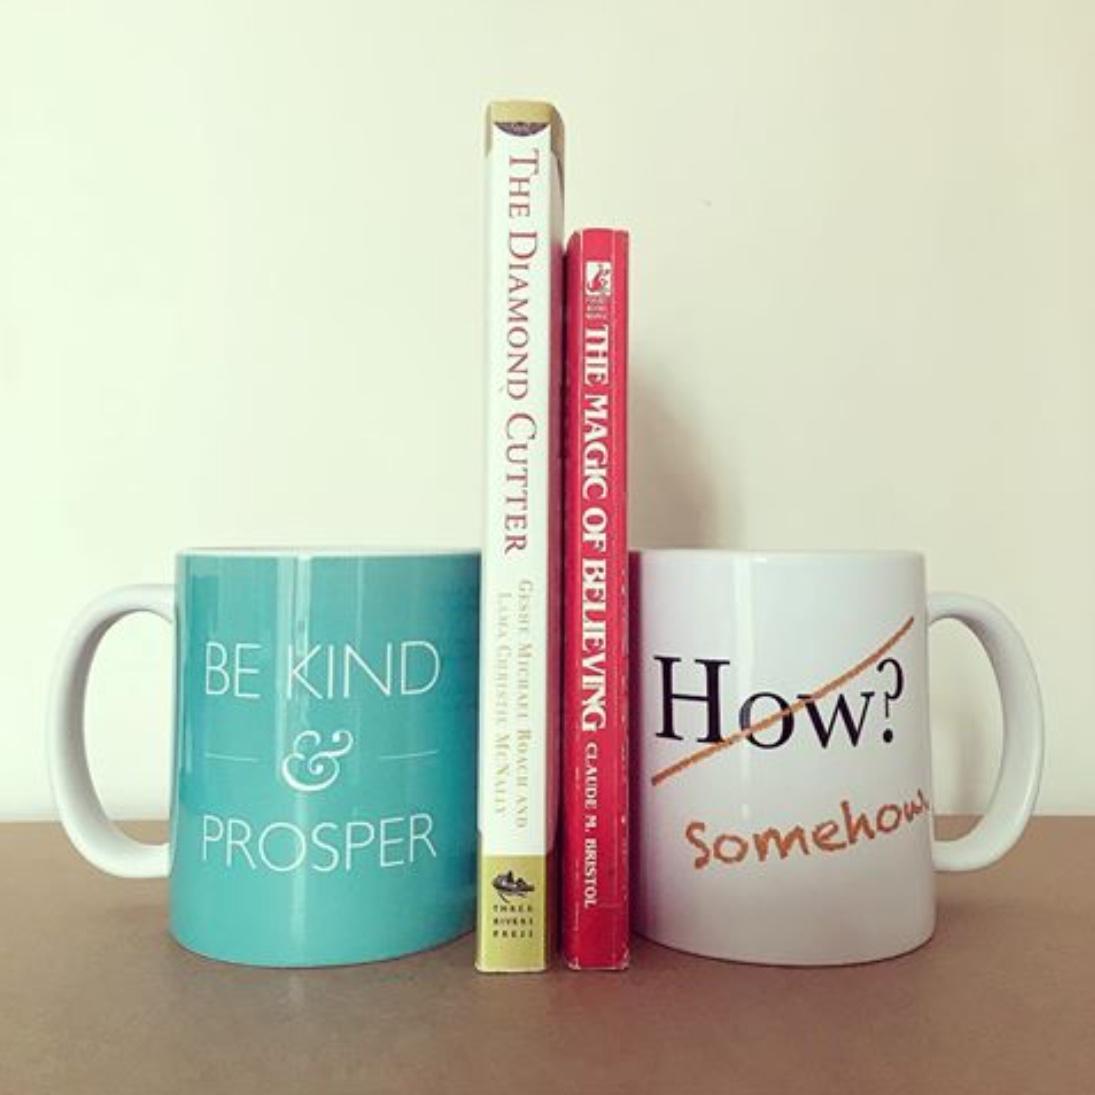 book ends mugs magic of believing diamond cutter